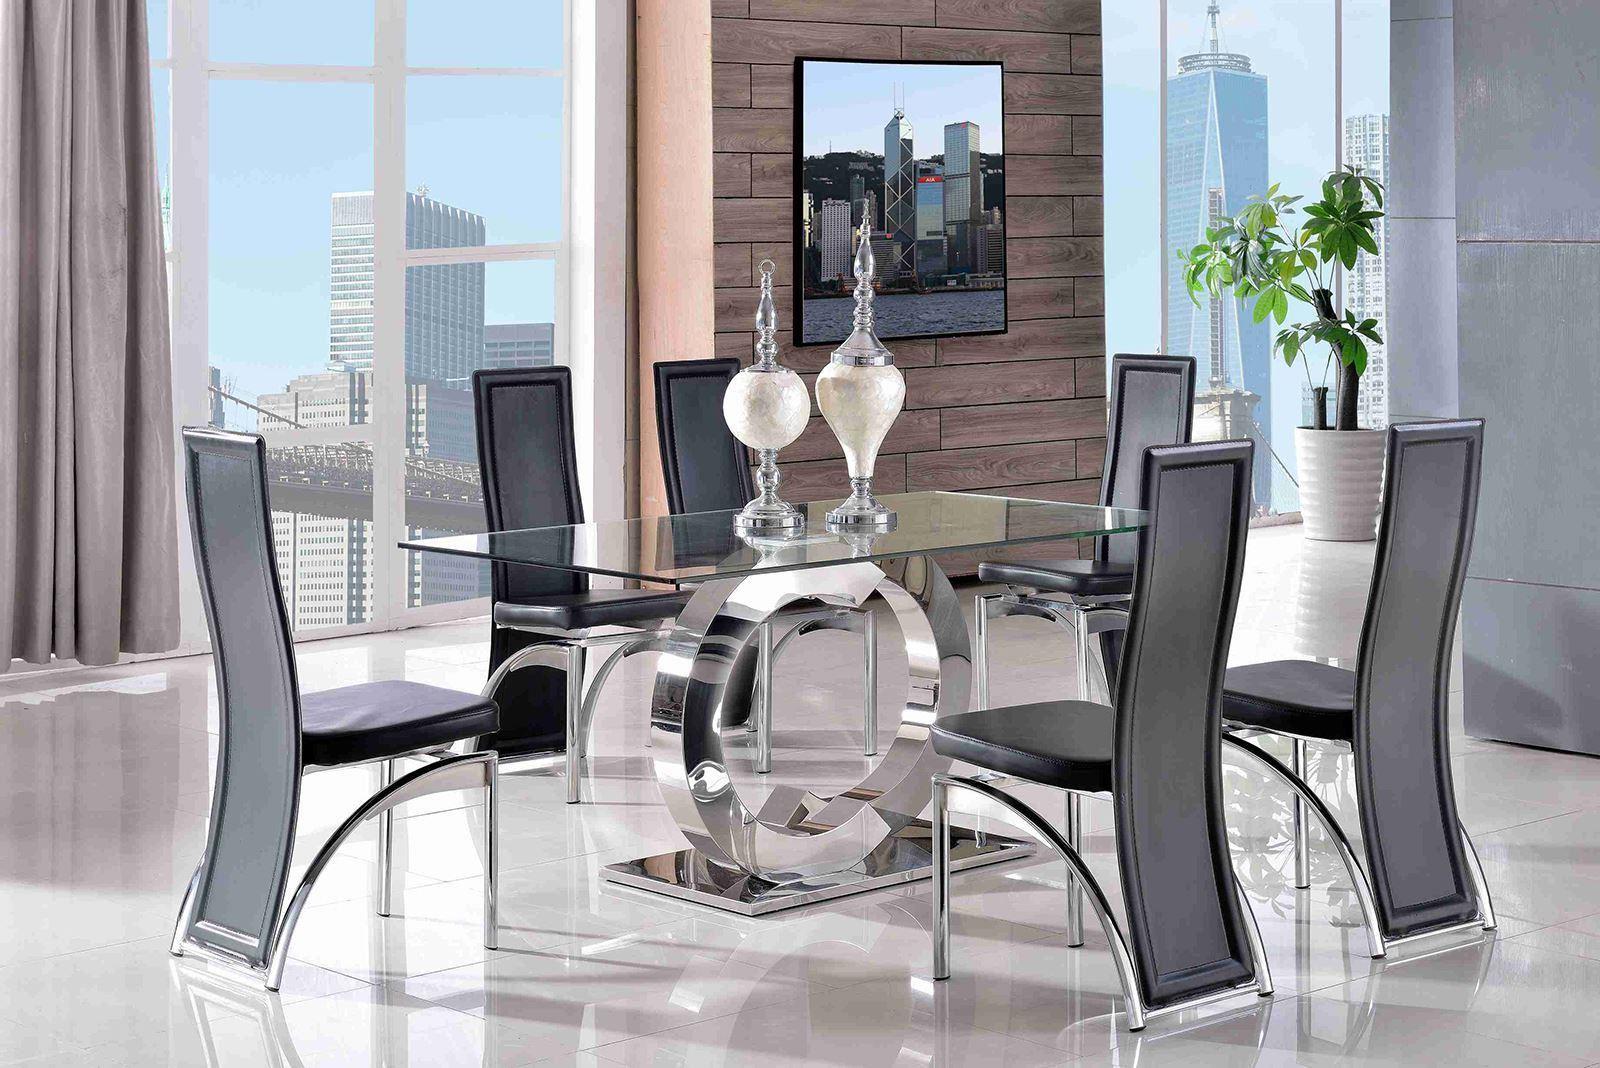 Argos Kitchen Furniture Kitchen Table And Chair Sets Argos Argos Round Kitchen Table And